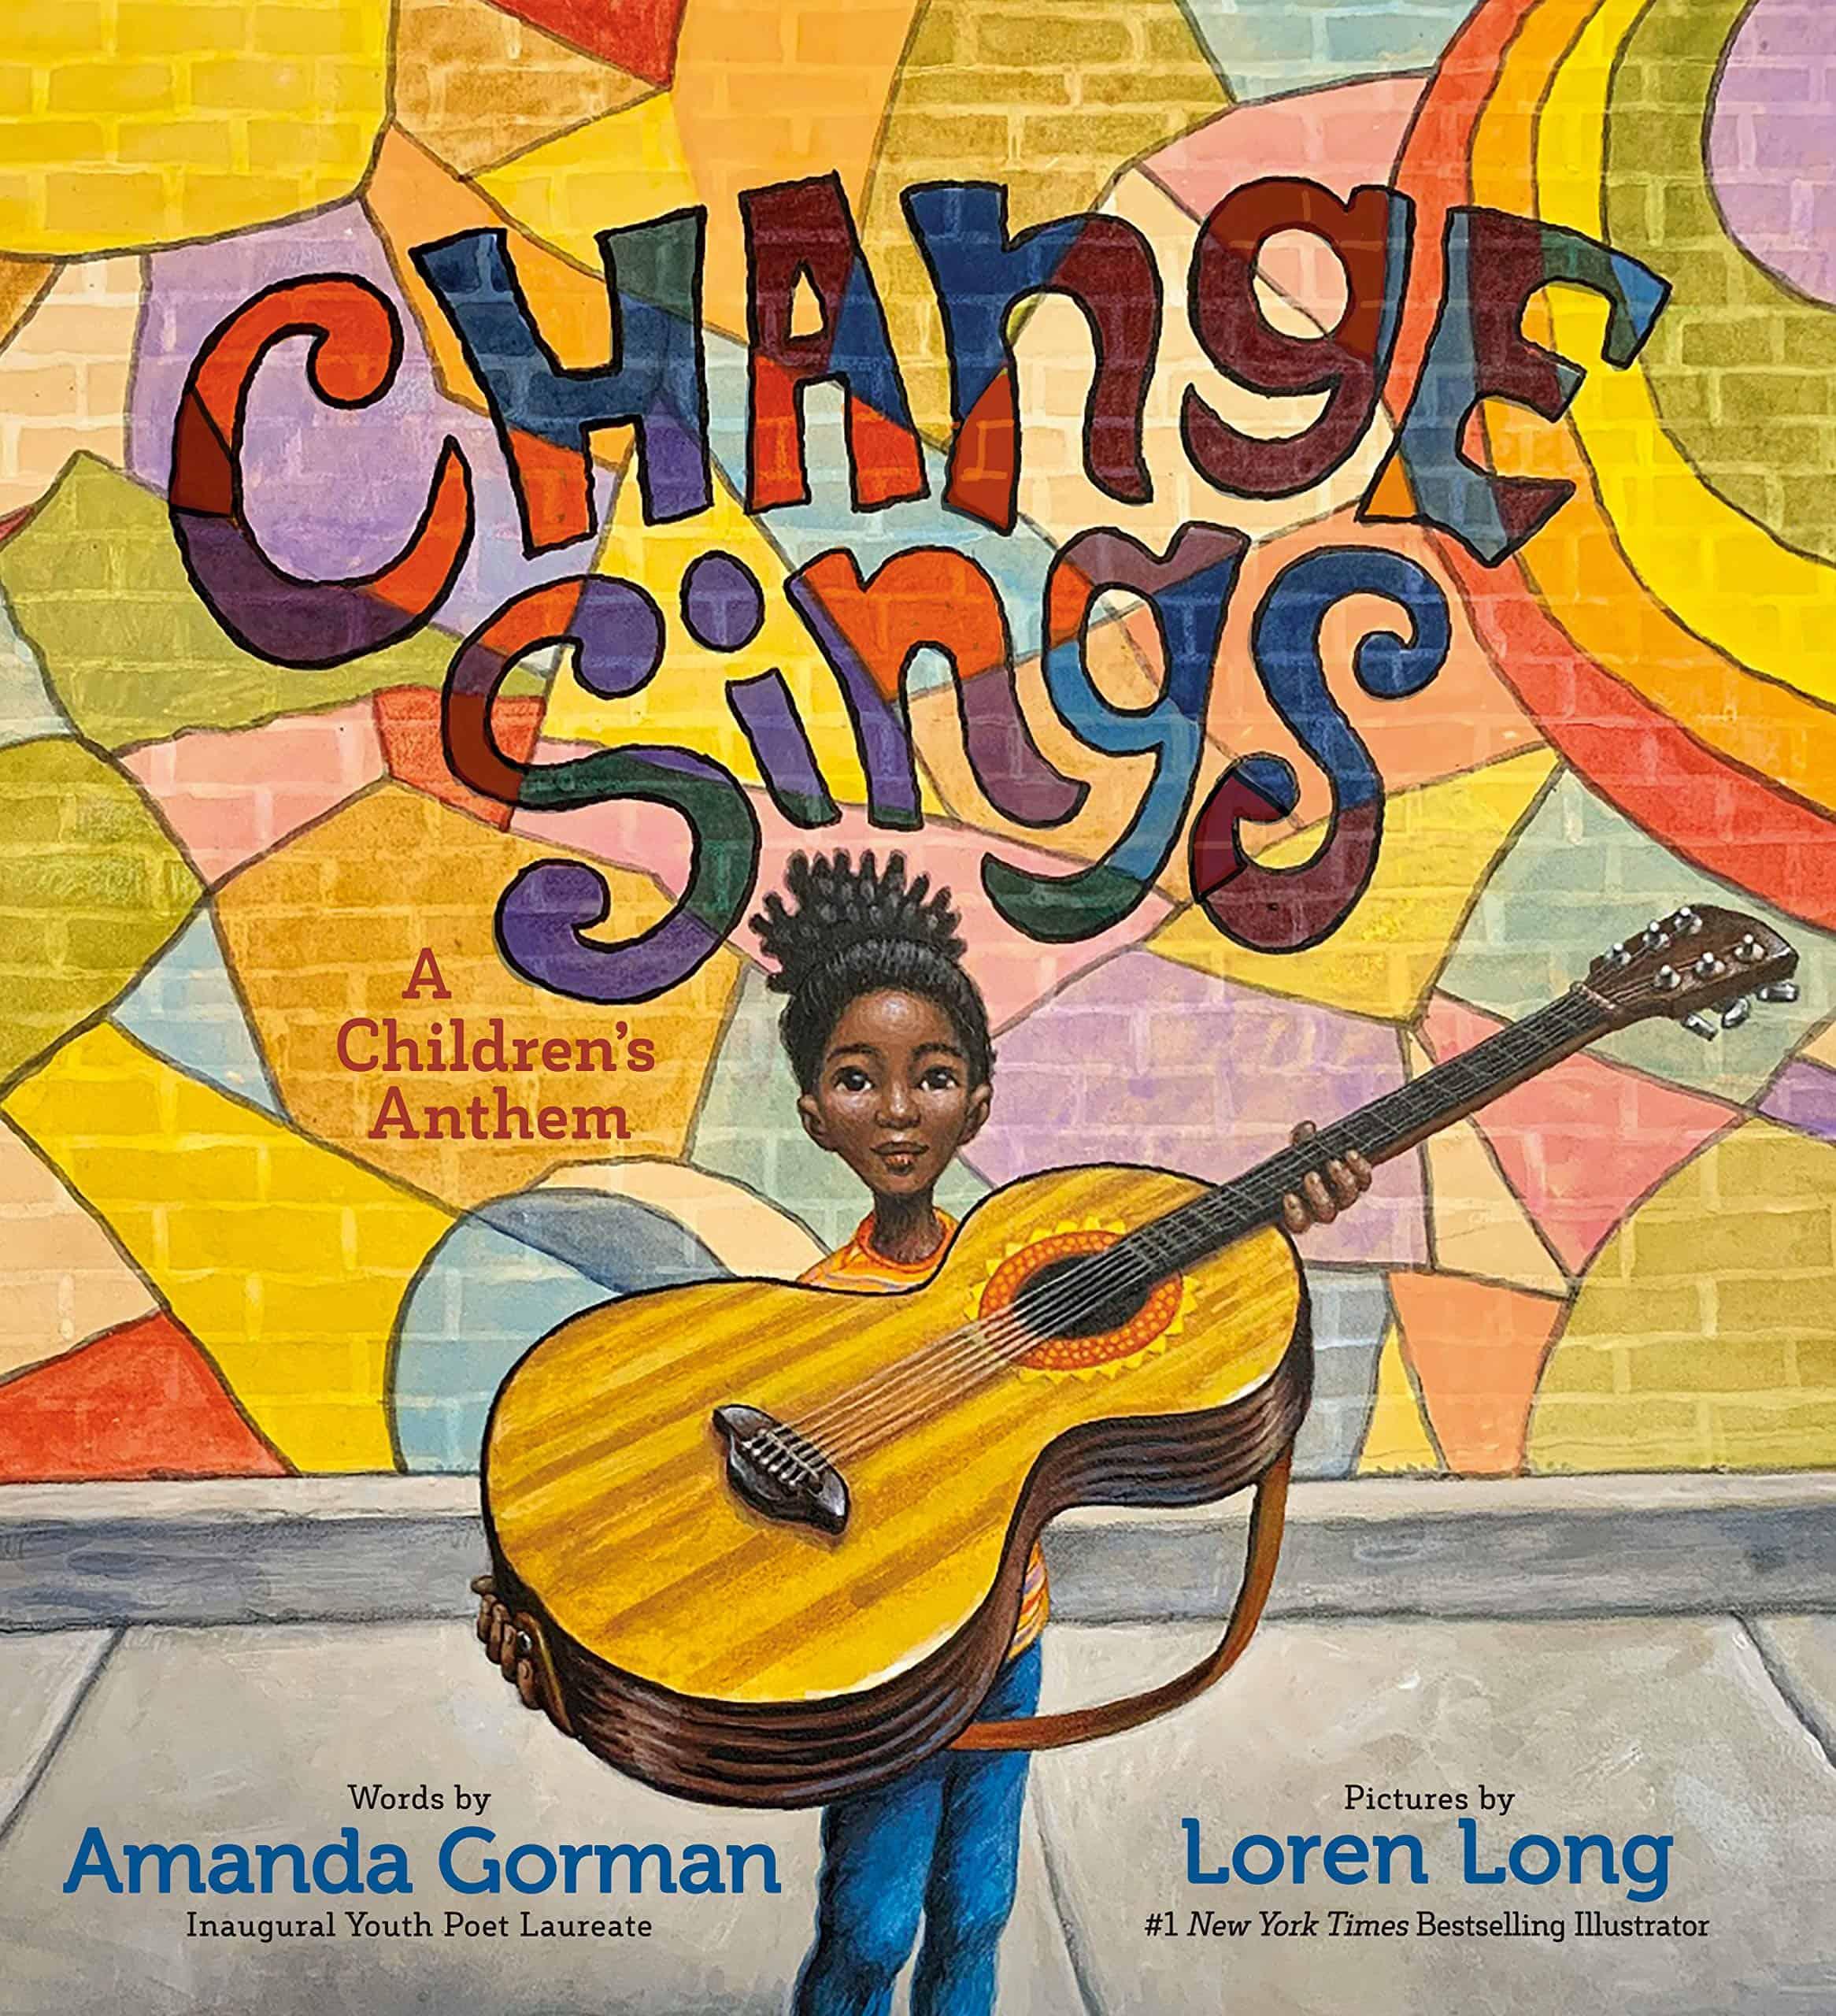 Amanda Gorman's Change Sings is a Beautiful Poetic Picture Book